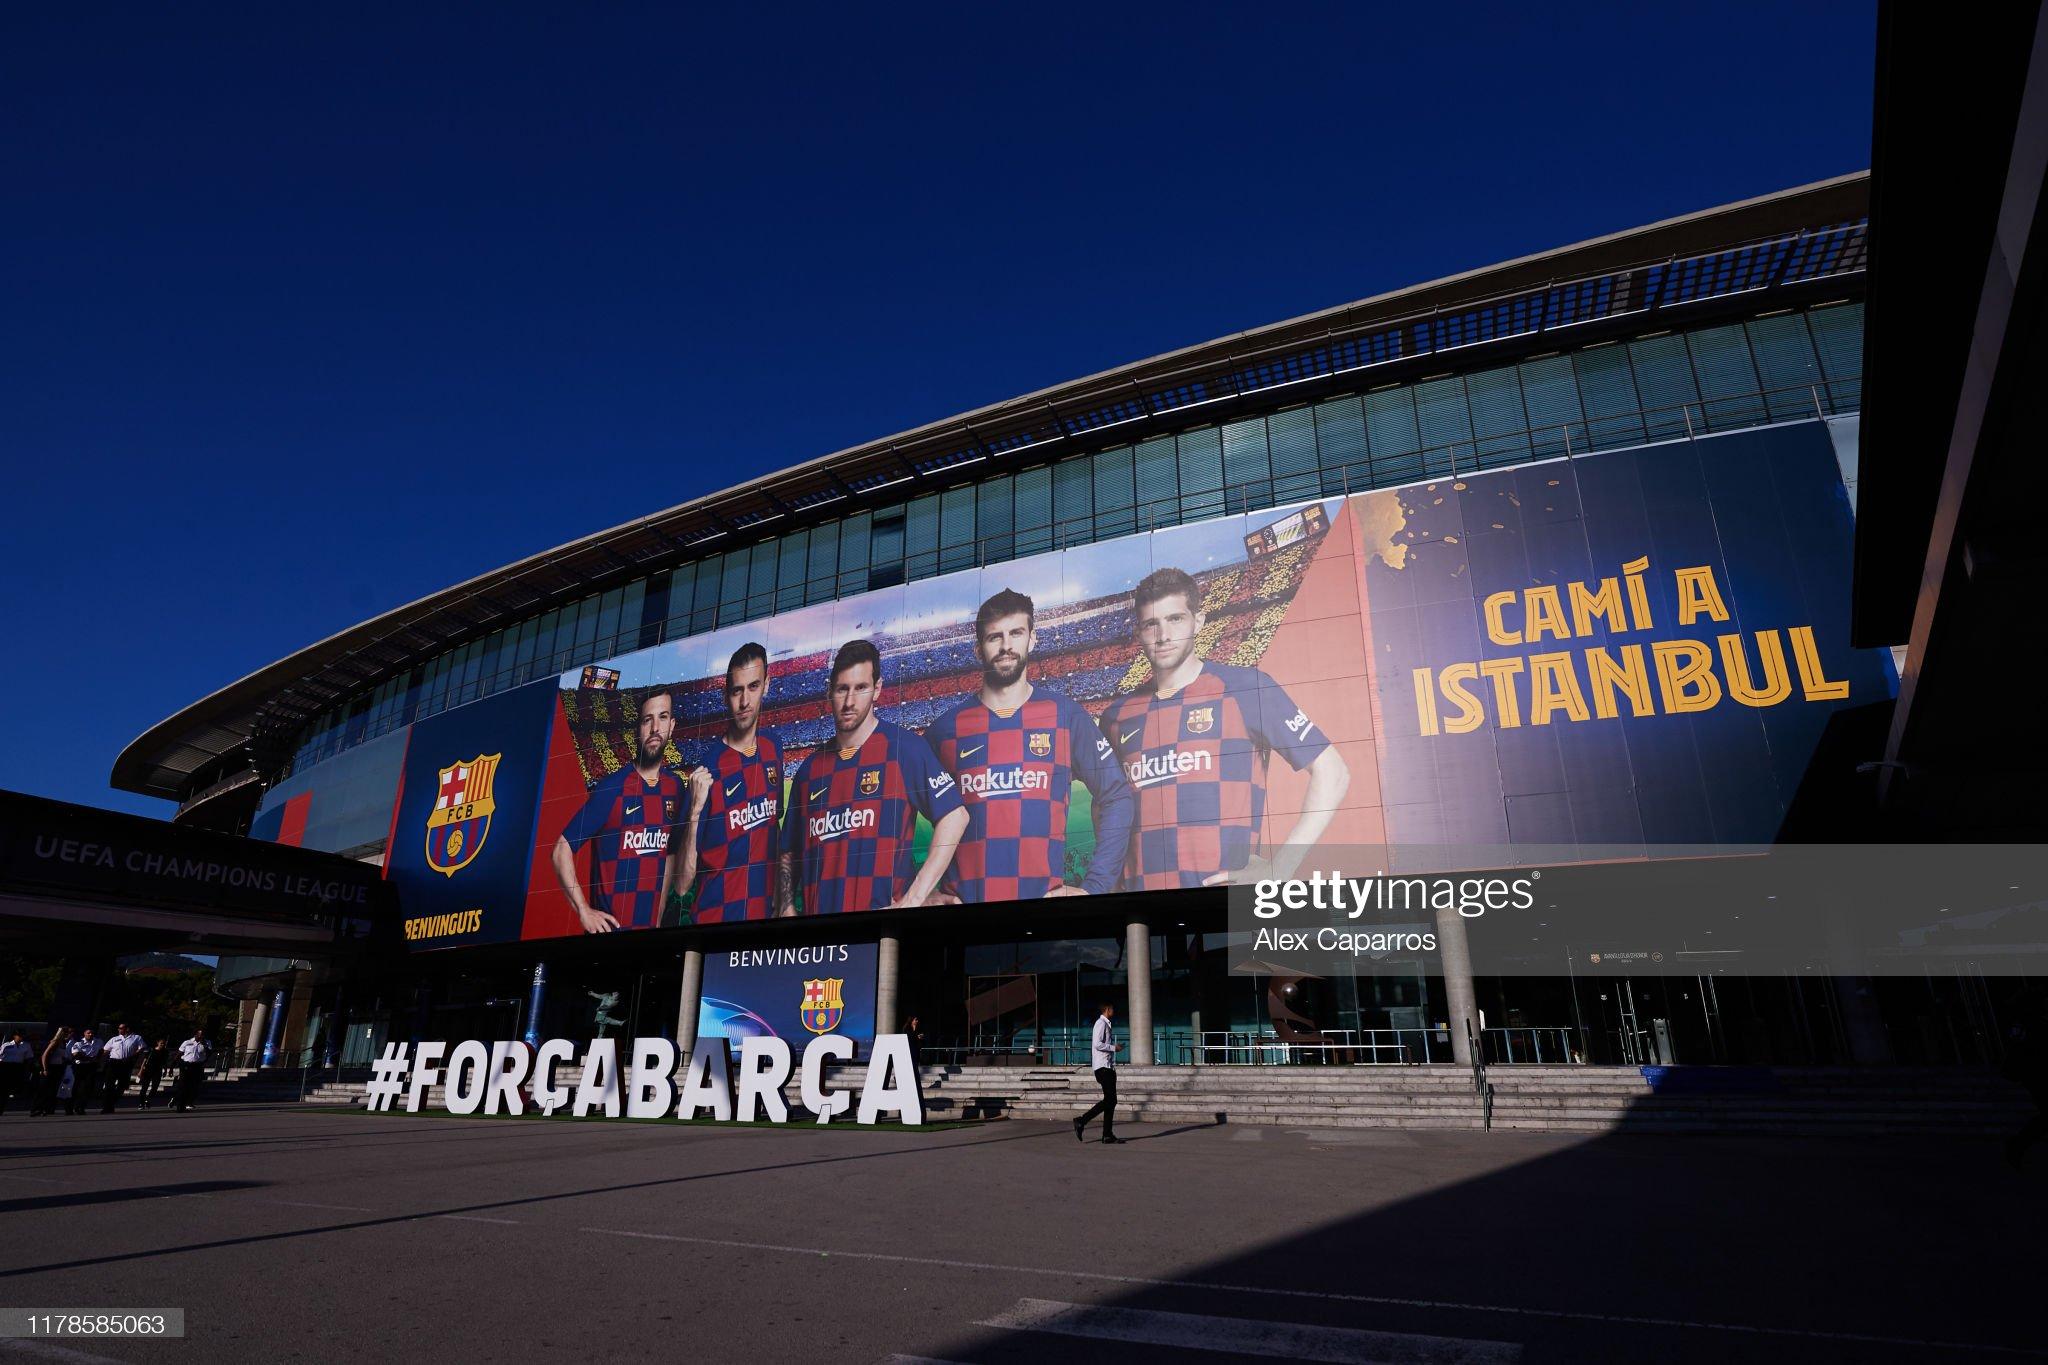 صور مباراة : برشلونة - إنتر 2-1 ( 02-10-2019 )  An-outside-view-of-the-camp-nou-stadium-ahead-of-the-uefa-champions-picture-id1178585063?s=2048x2048